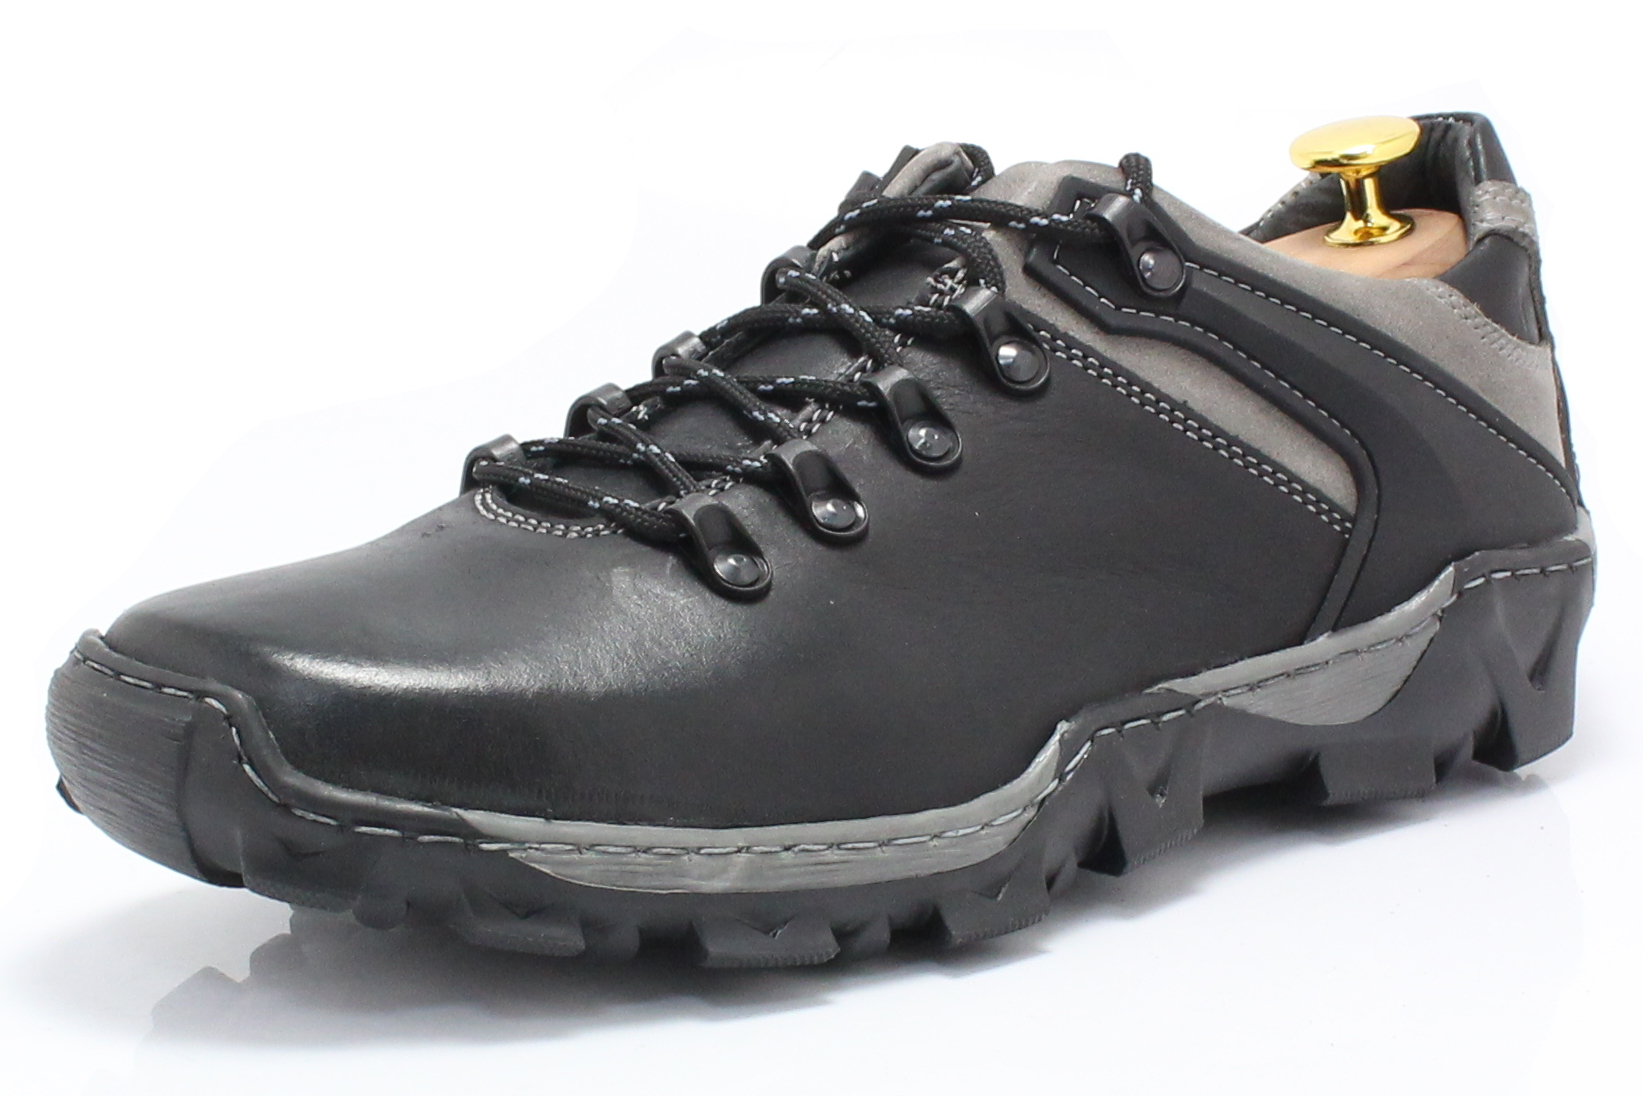 482fca77a7d50 KENT 116 CZARNO-SZARE - Trekkingowe buty męskie 100% skórzane ...